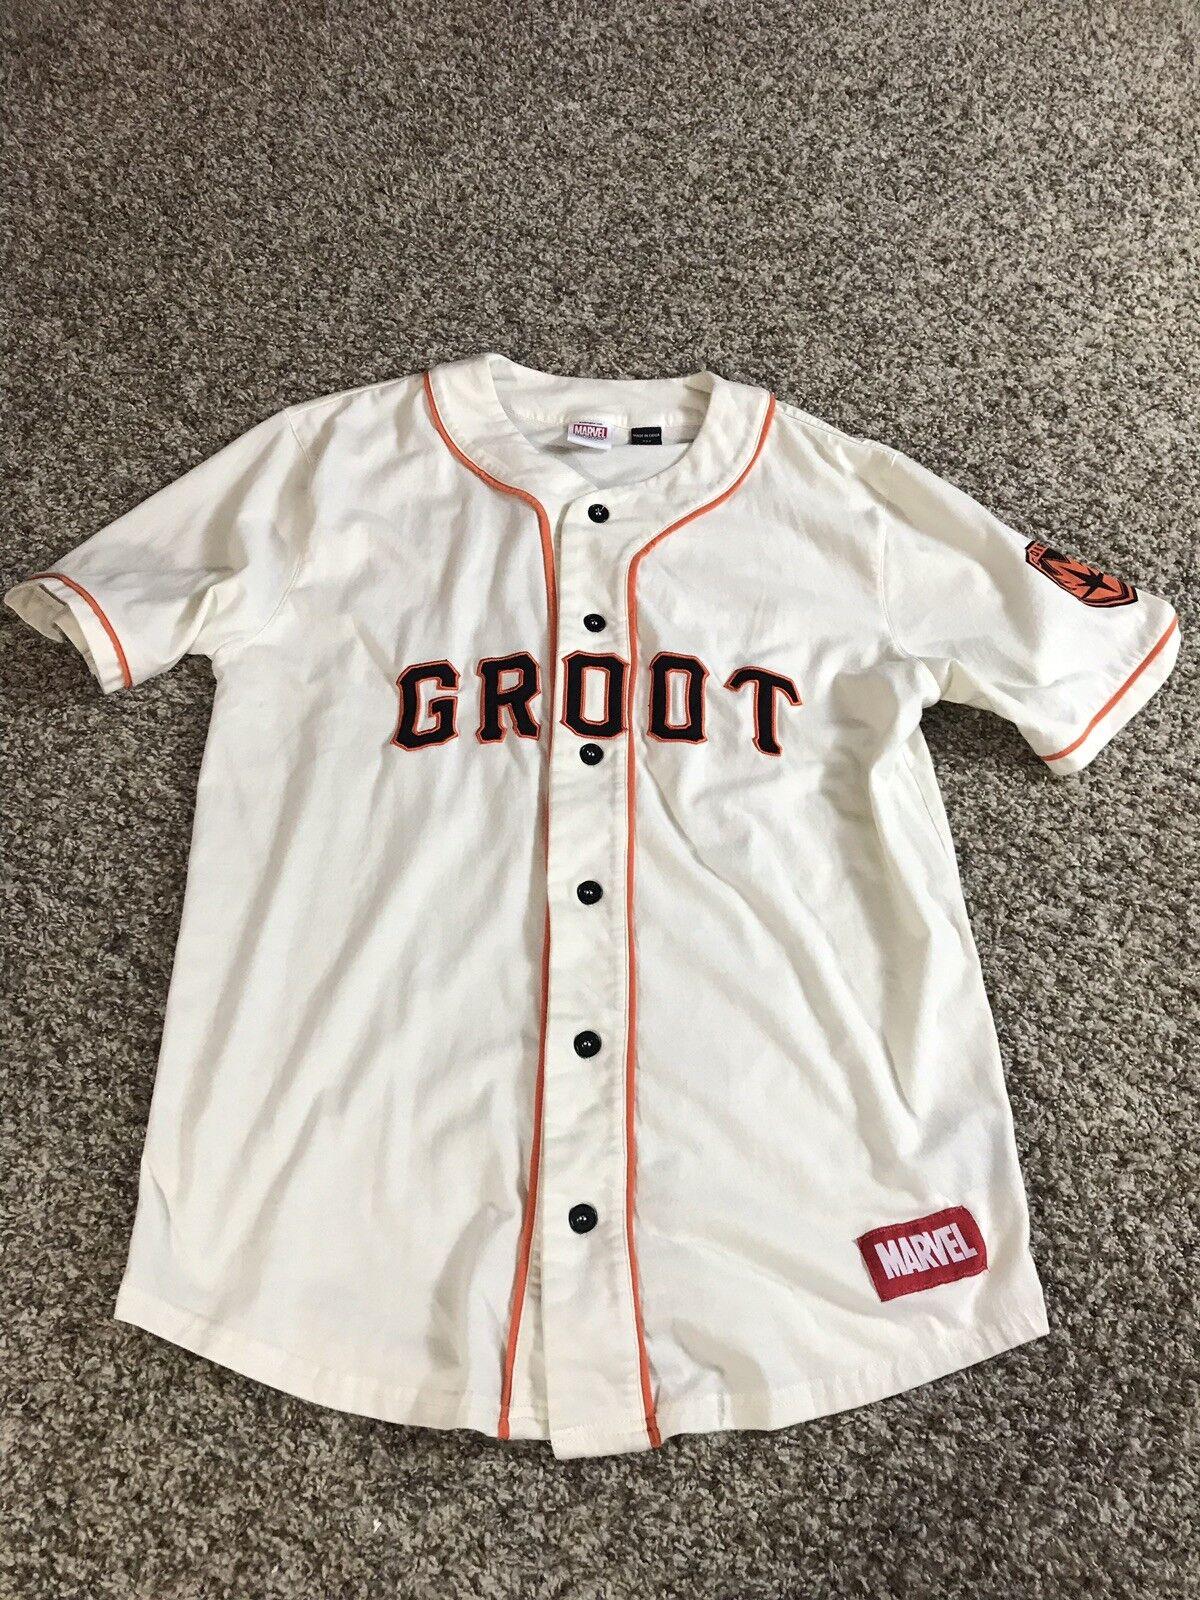 Marvel Groot San Francisco Giants Themed Comic Book Hero Baseball Jersey - S/M